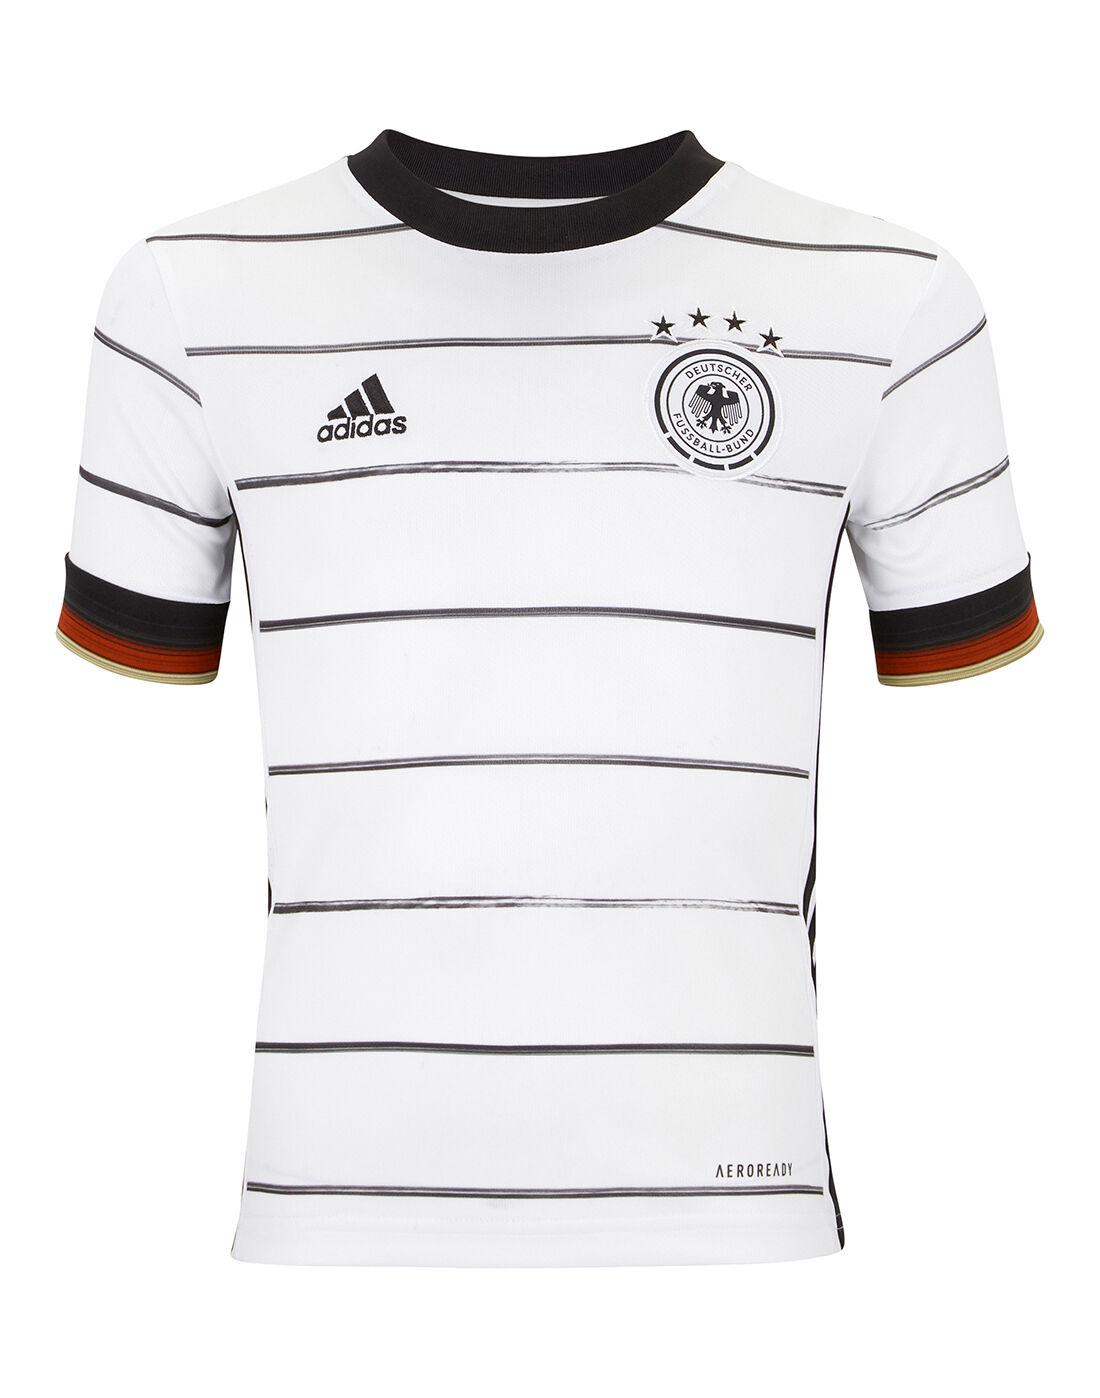 adidas Kids Germany Euro 2020 Home Jersey - White | nike adidas ...